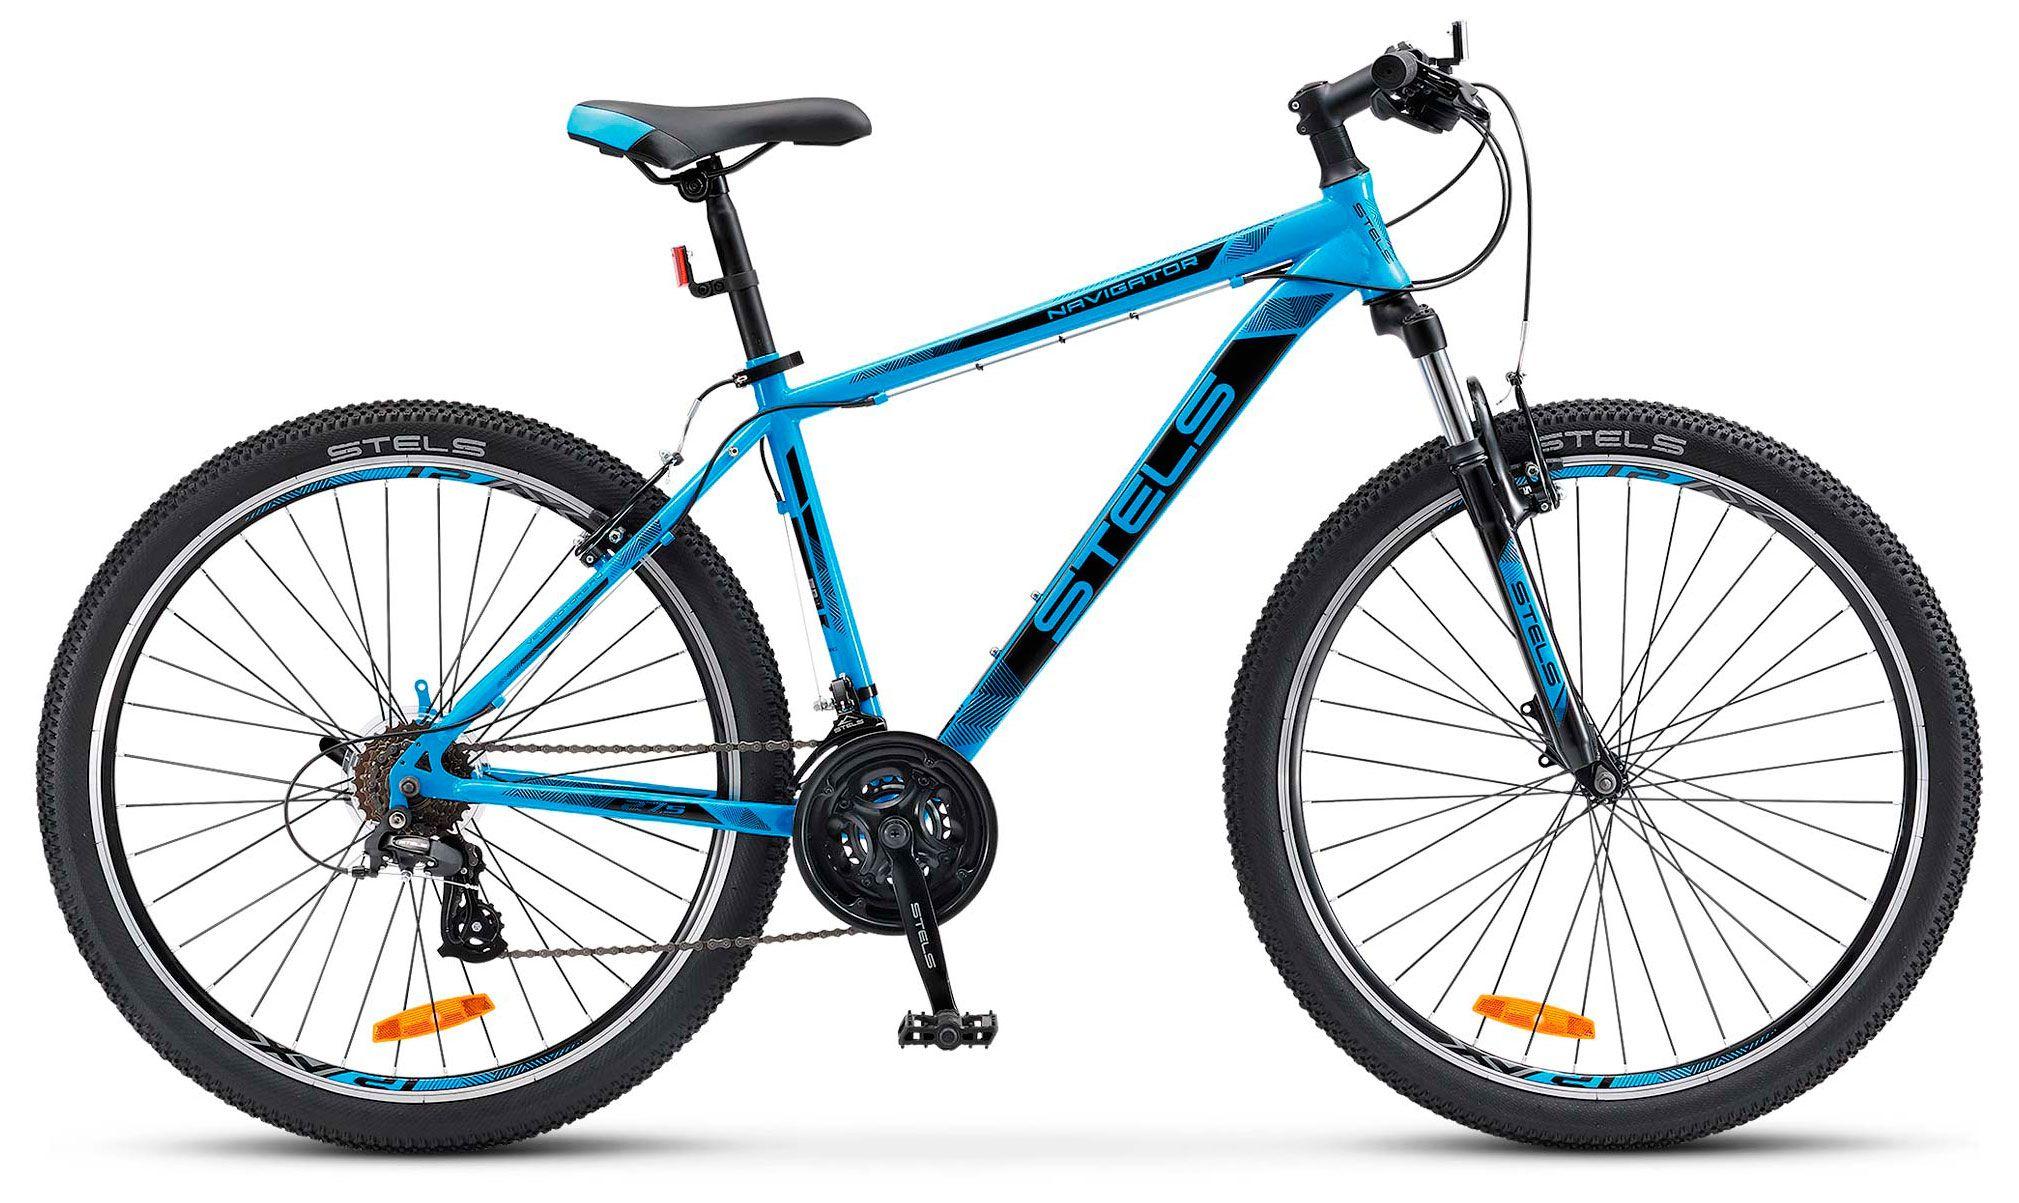 Велосипед Stels Navigator 500 V 27.5 (V020) 2018 велосипед stels navigator 600 v 26 v020 16 антрацитовый зелёный